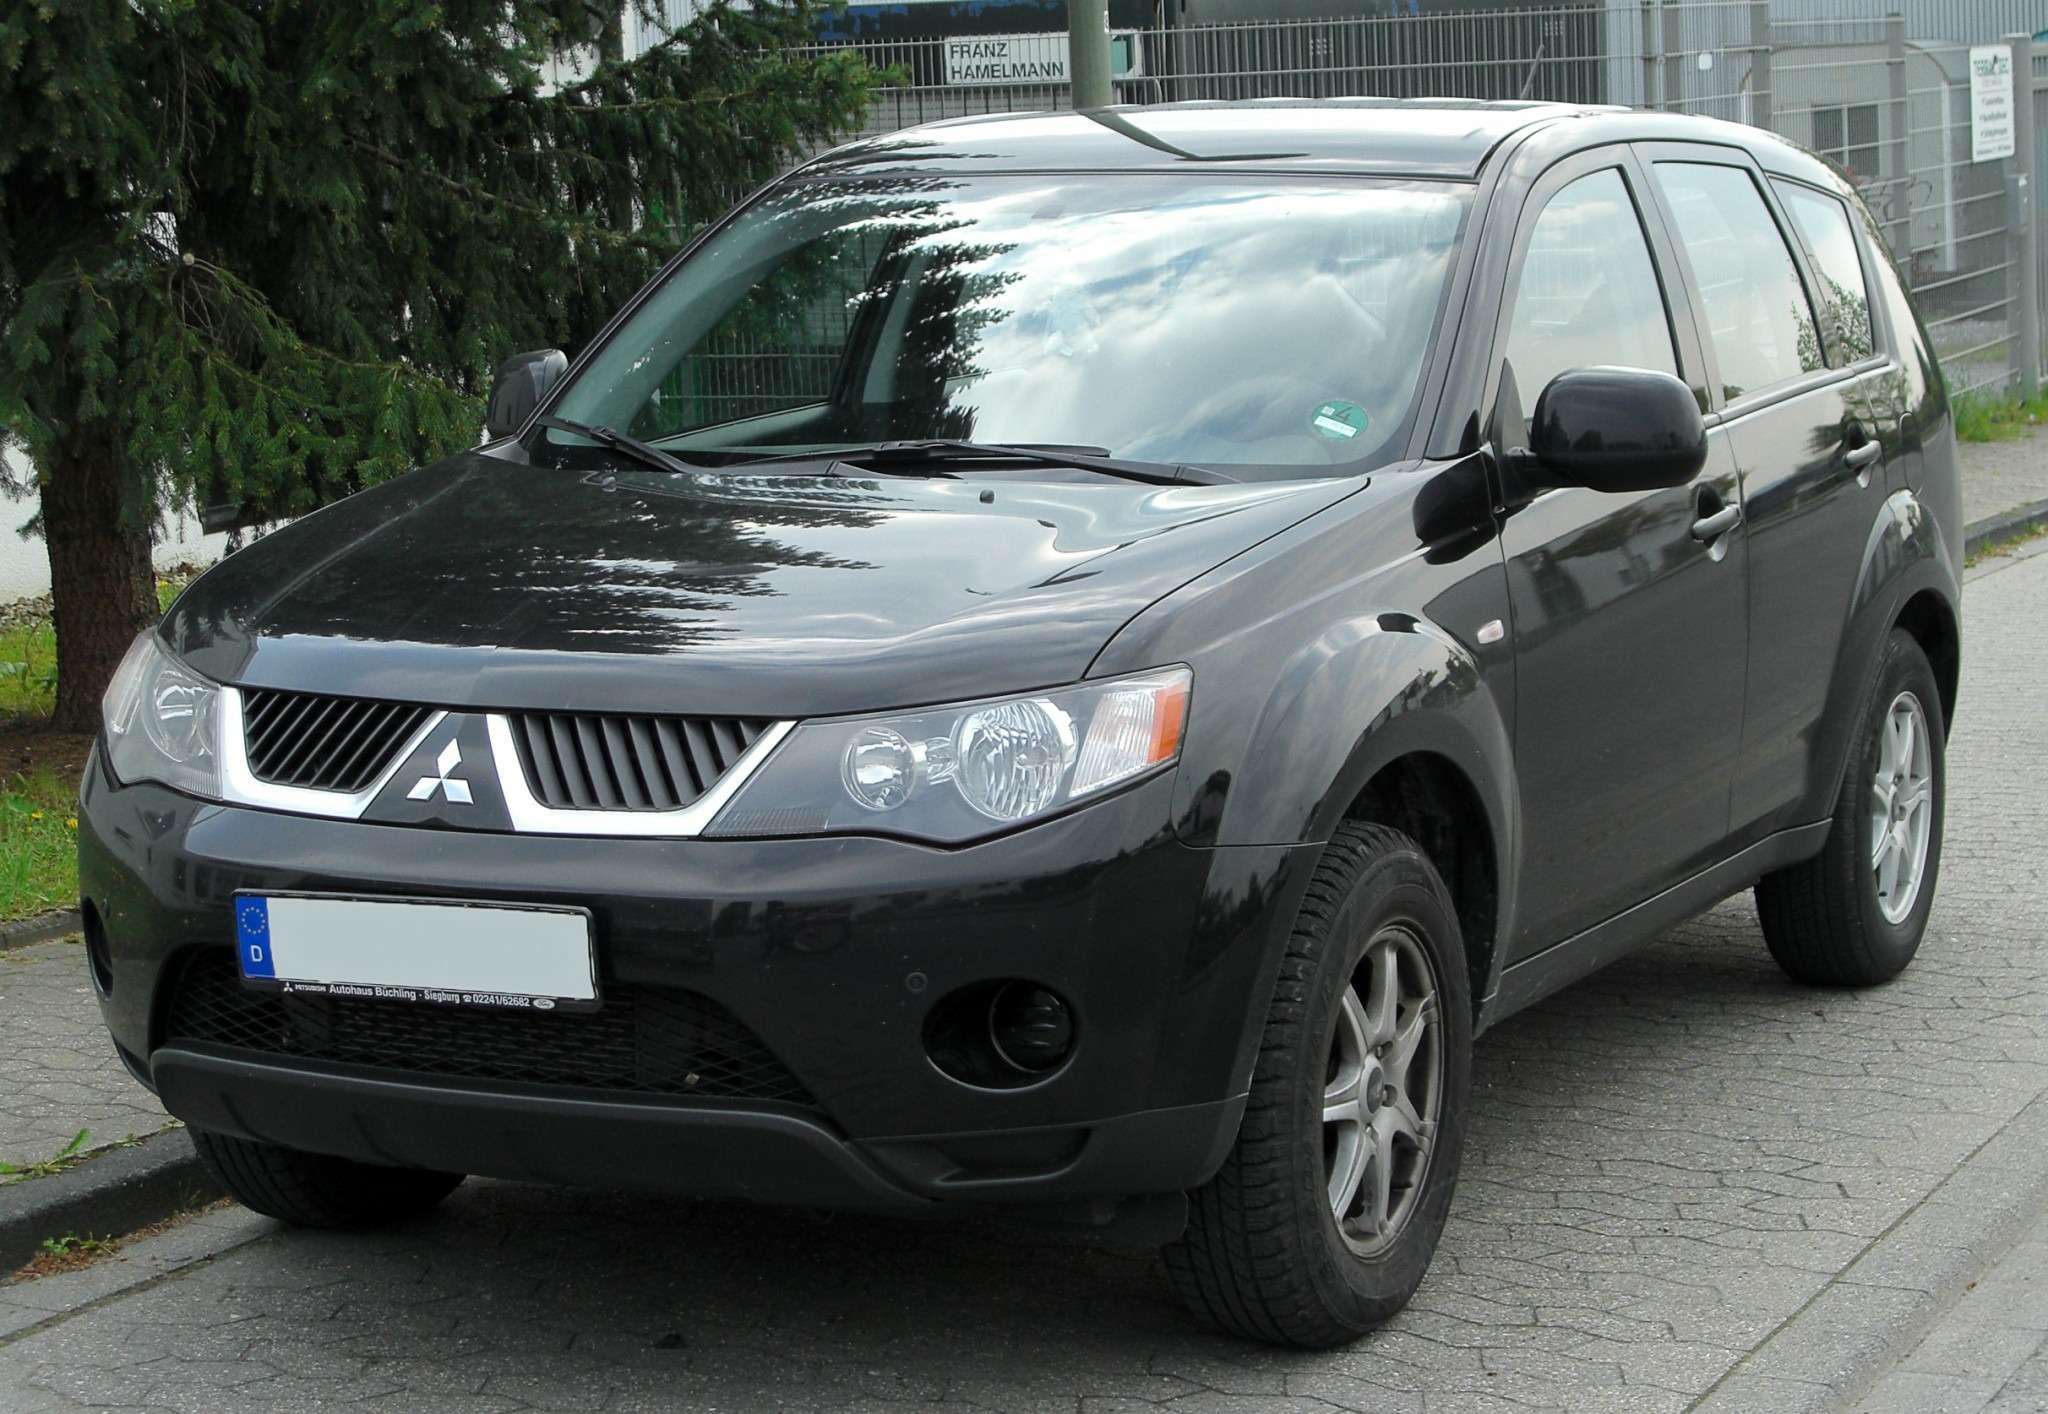 Mitsubishi_Outlander_II_front_20100509